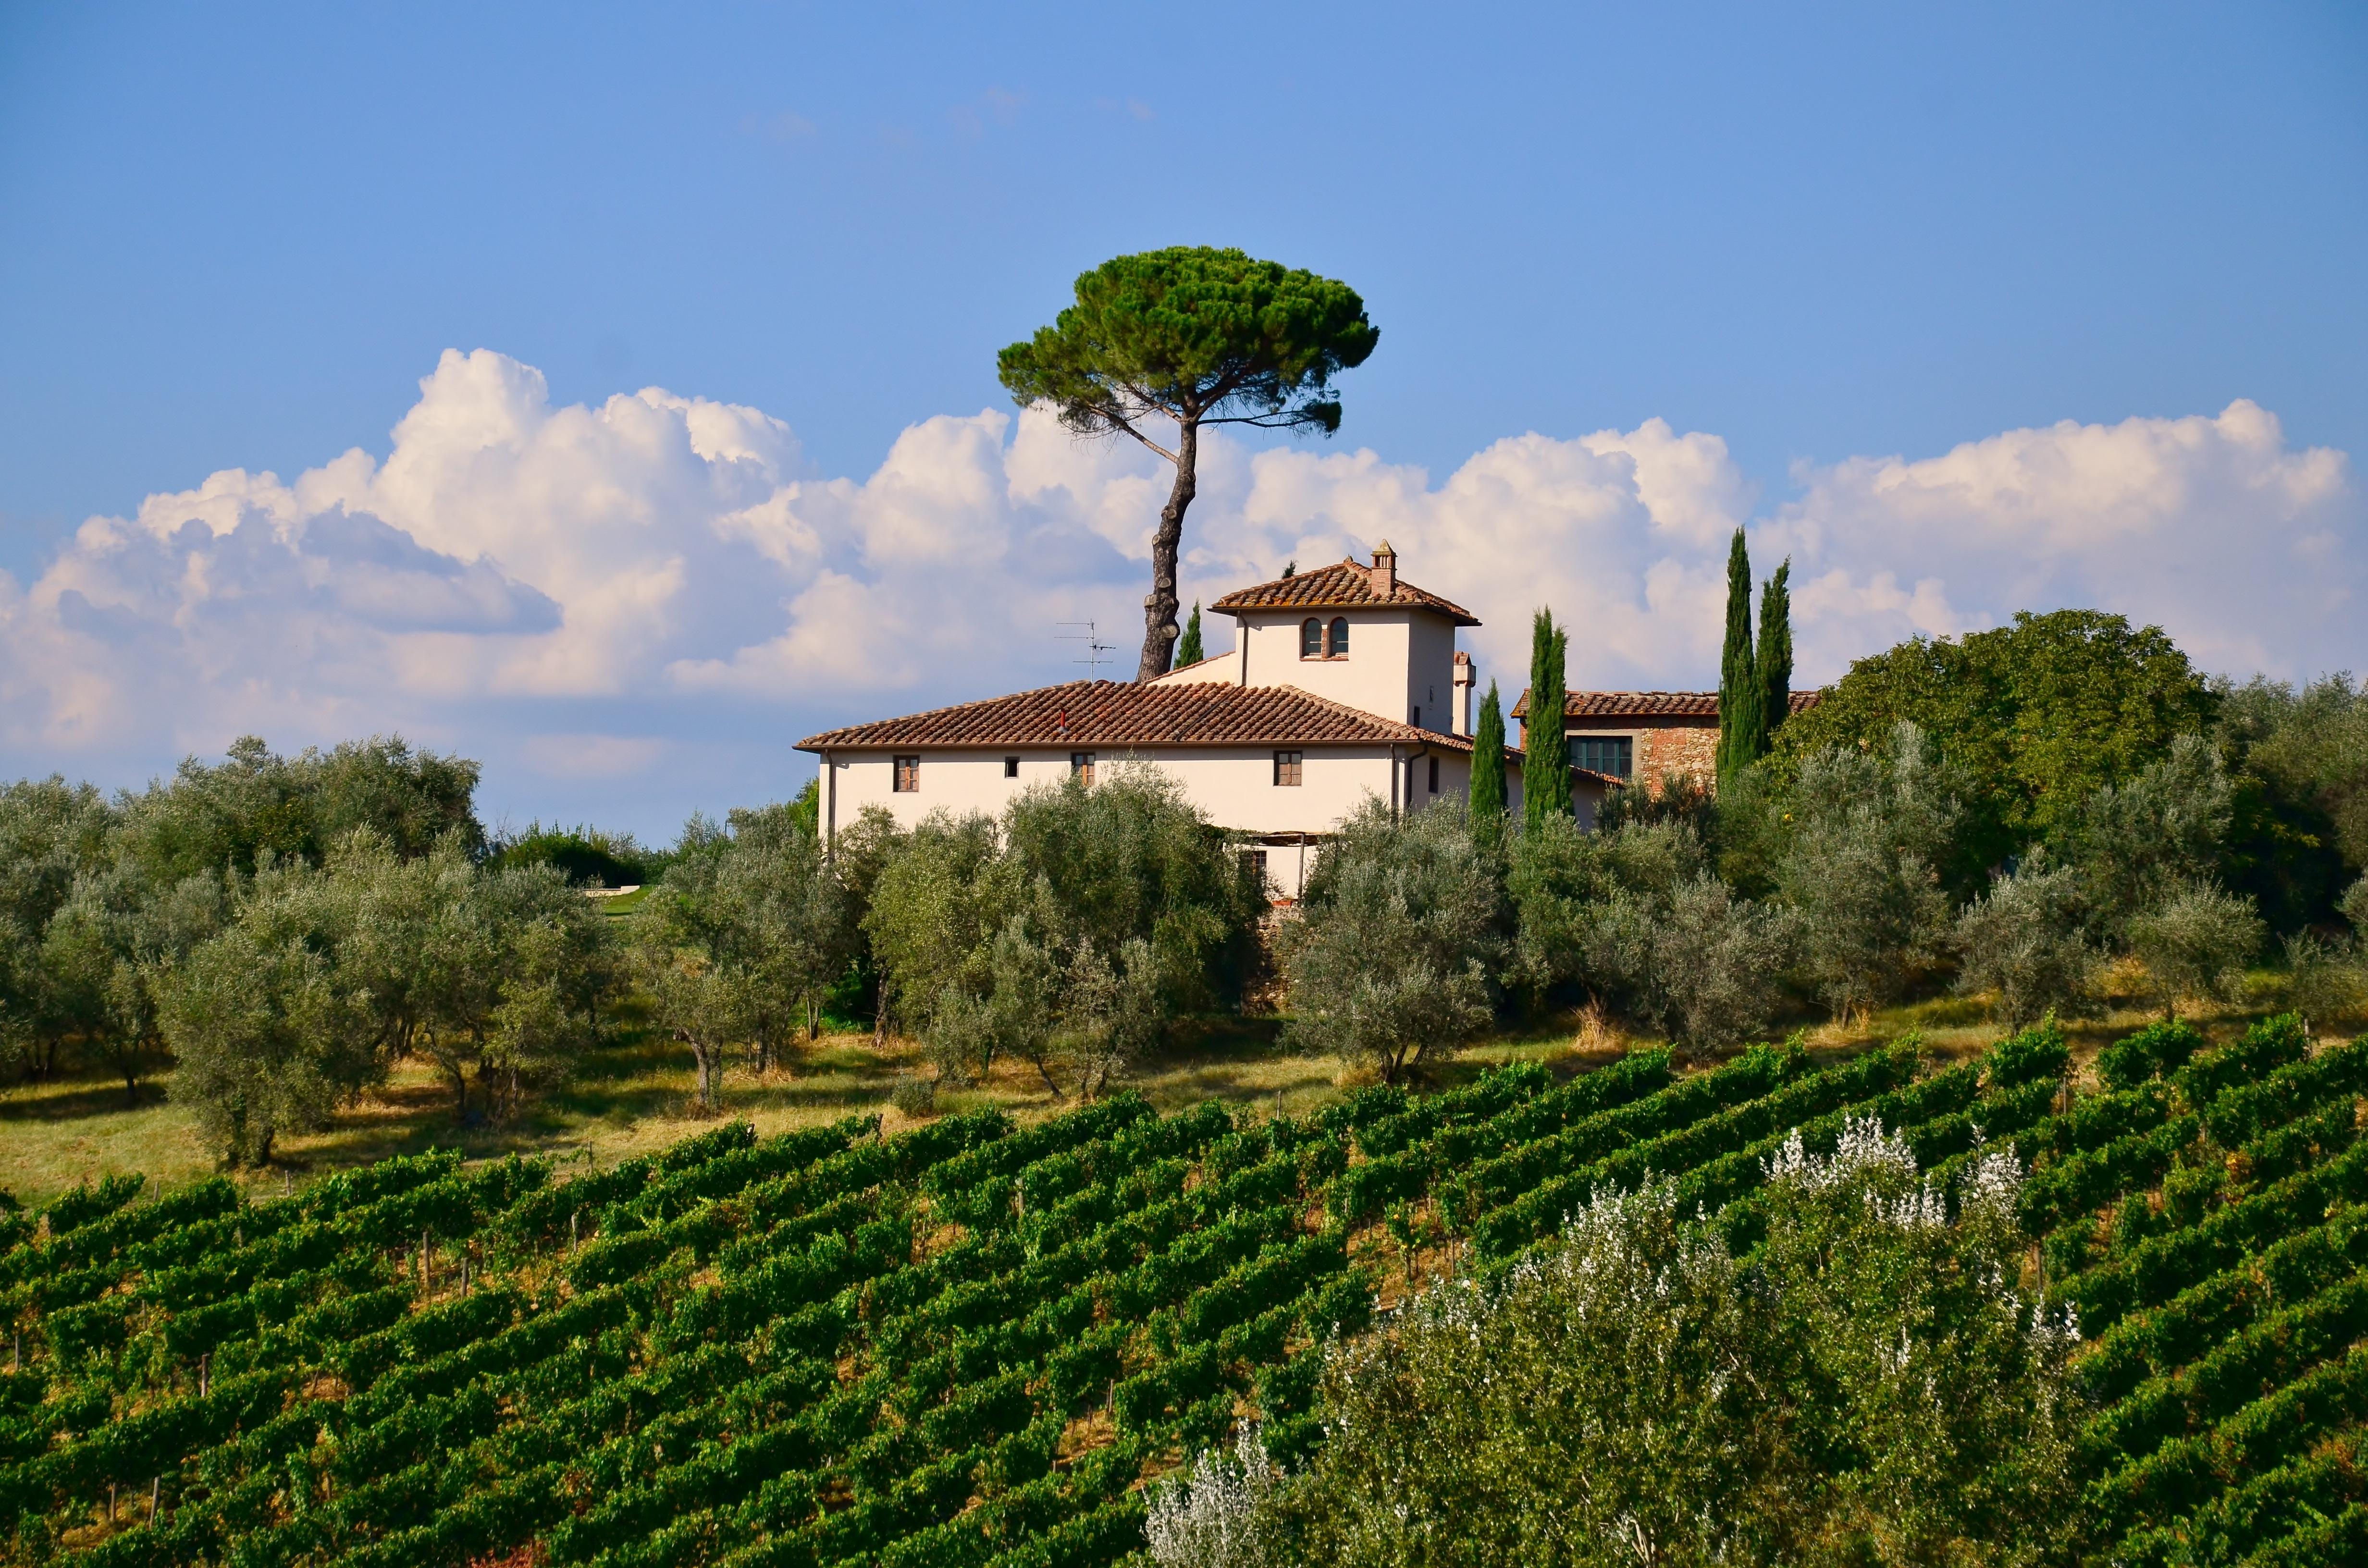 Дома с виноградниками фото